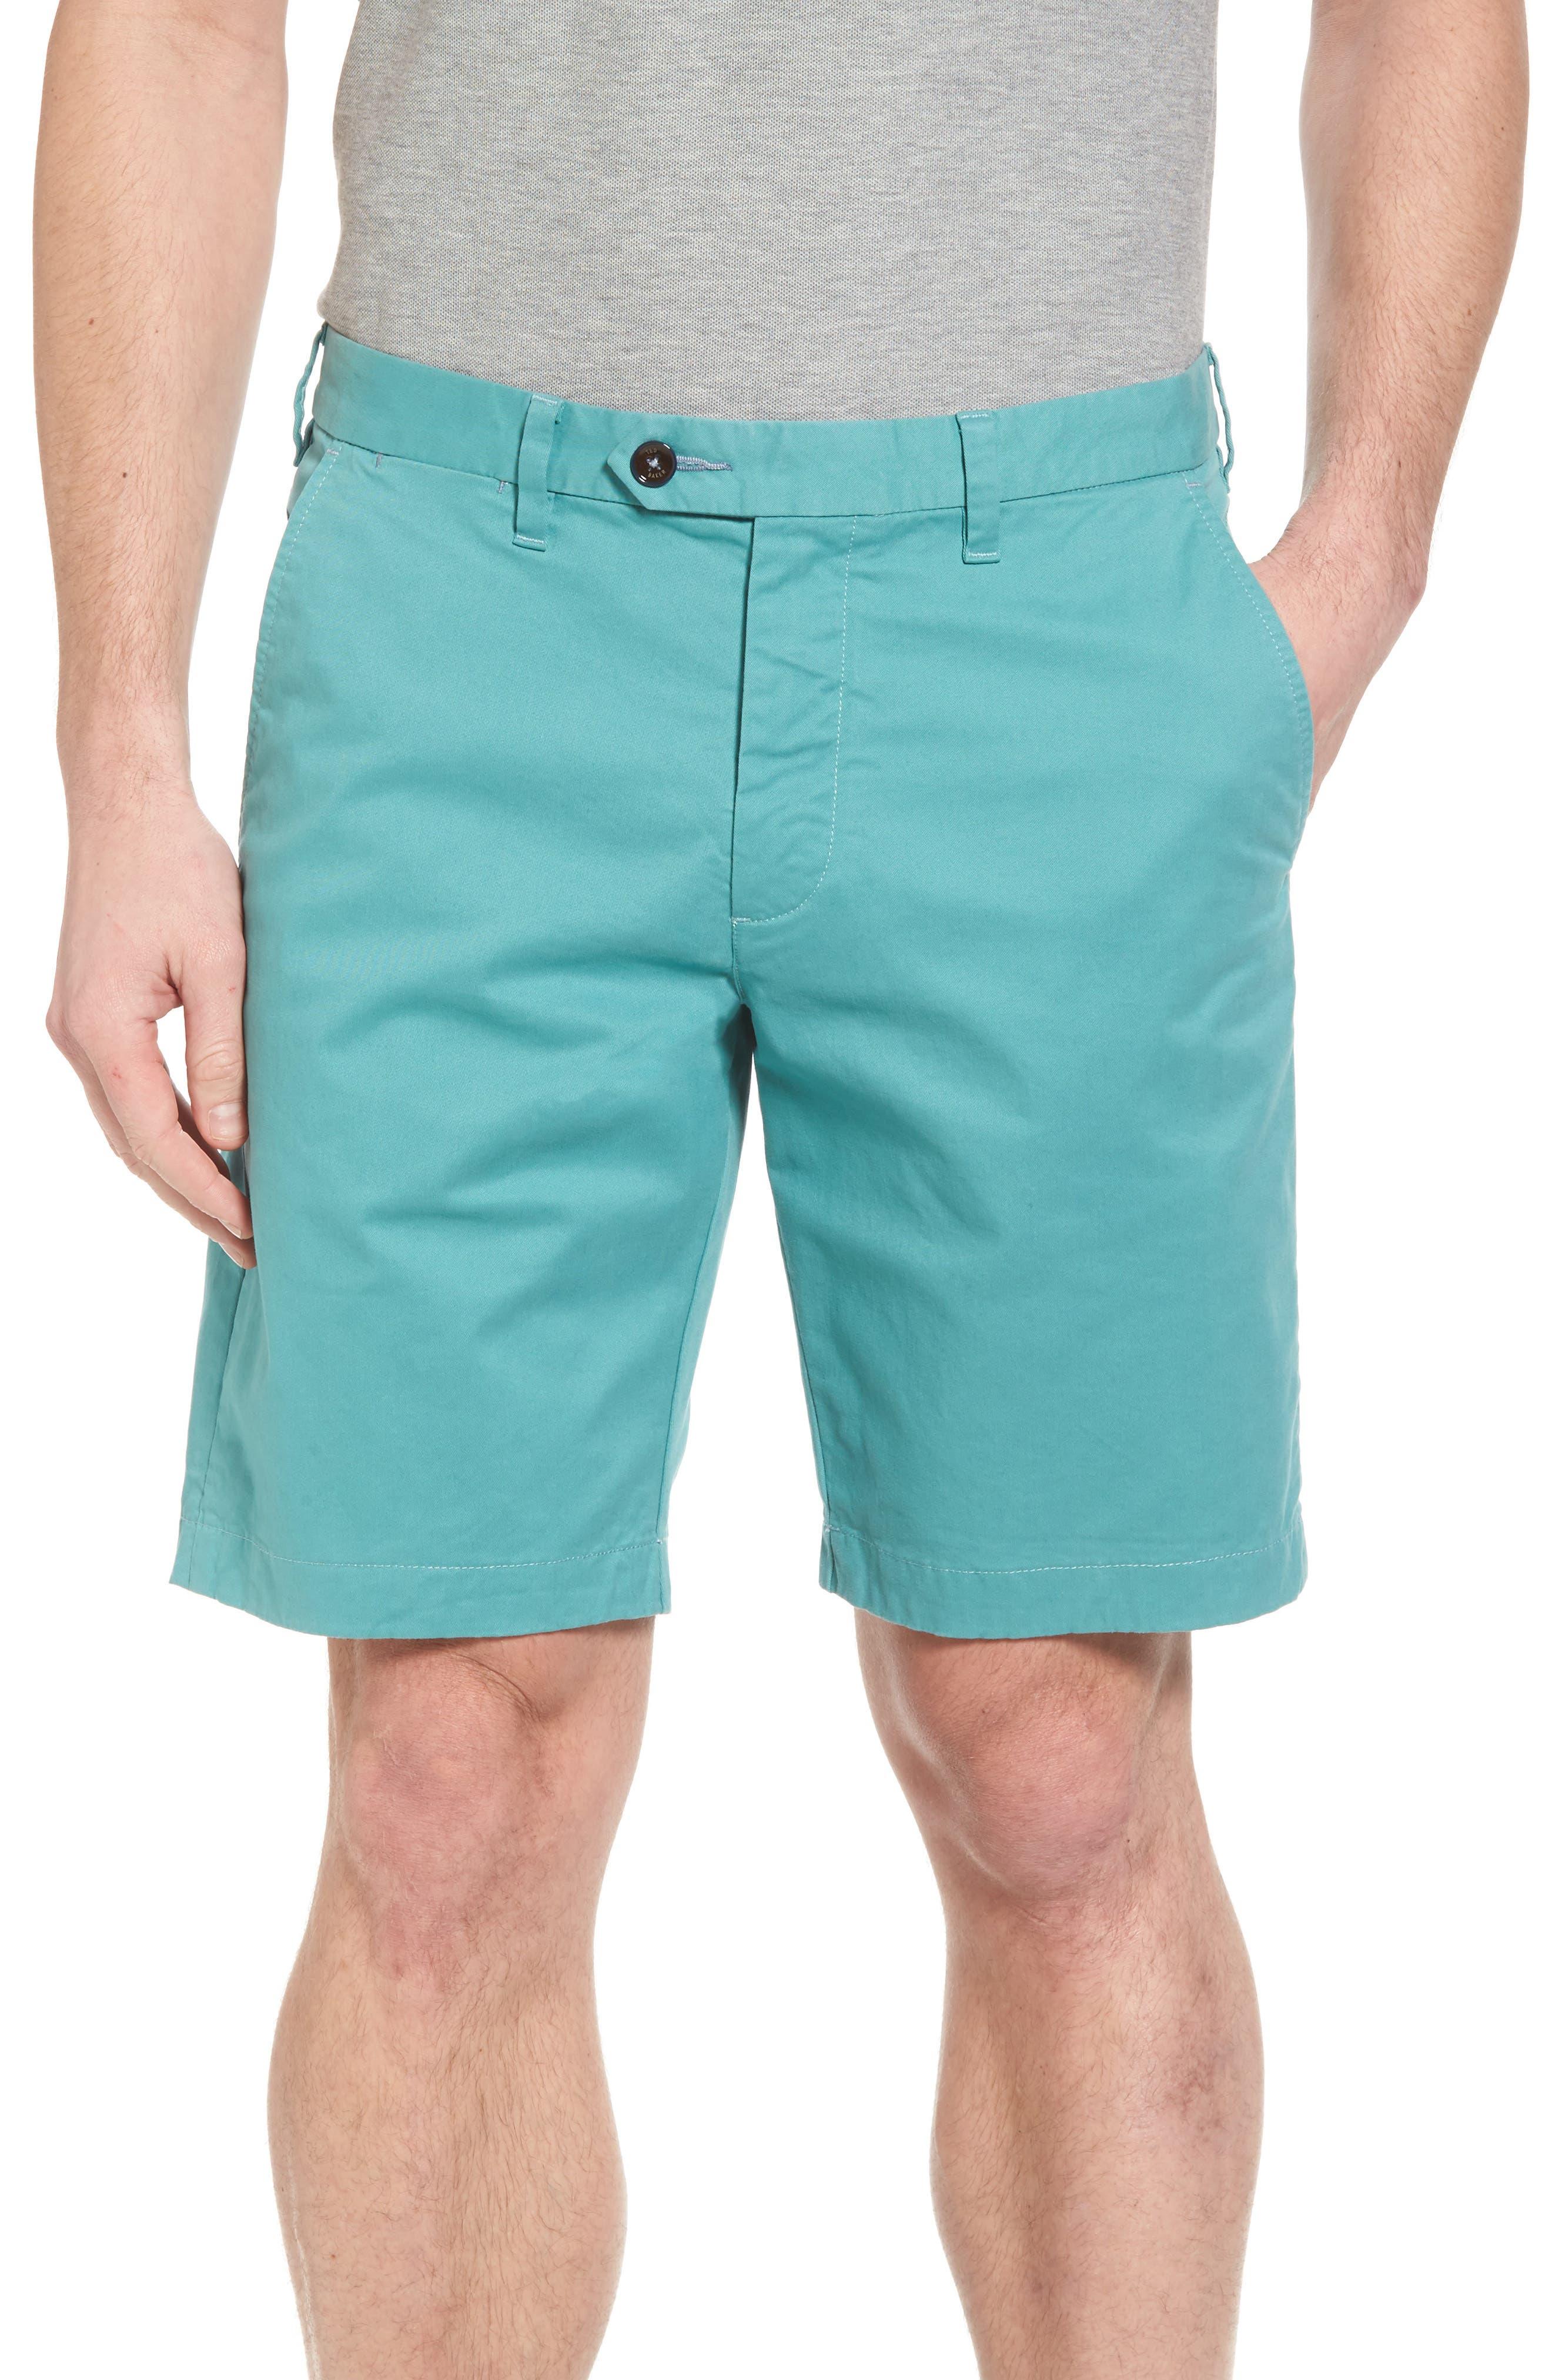 Proshtt Stretch Cotton Shorts,                             Main thumbnail 1, color,                             Pale Green